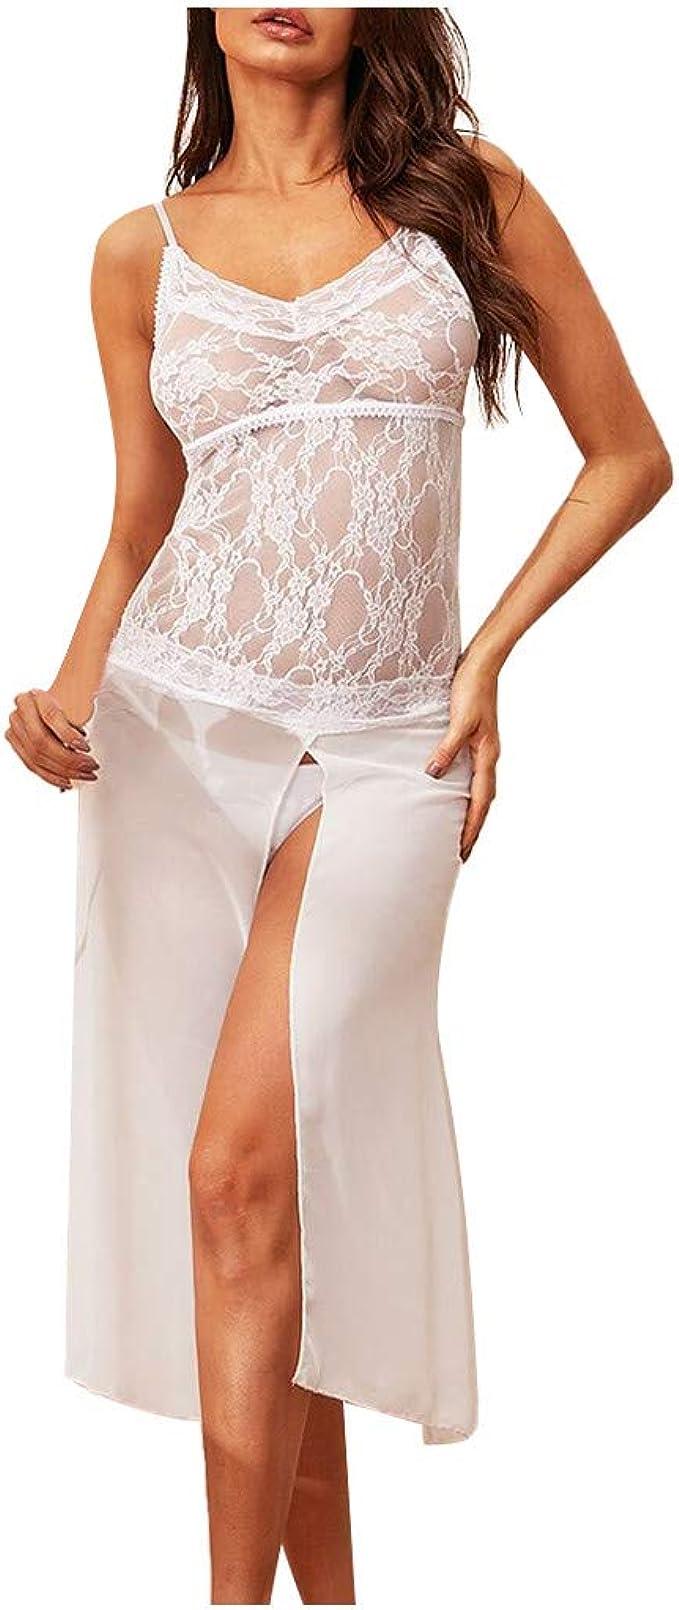 Damen Kleider Sexy Weiß Spitze Lang V-Ausschnitt Negligee